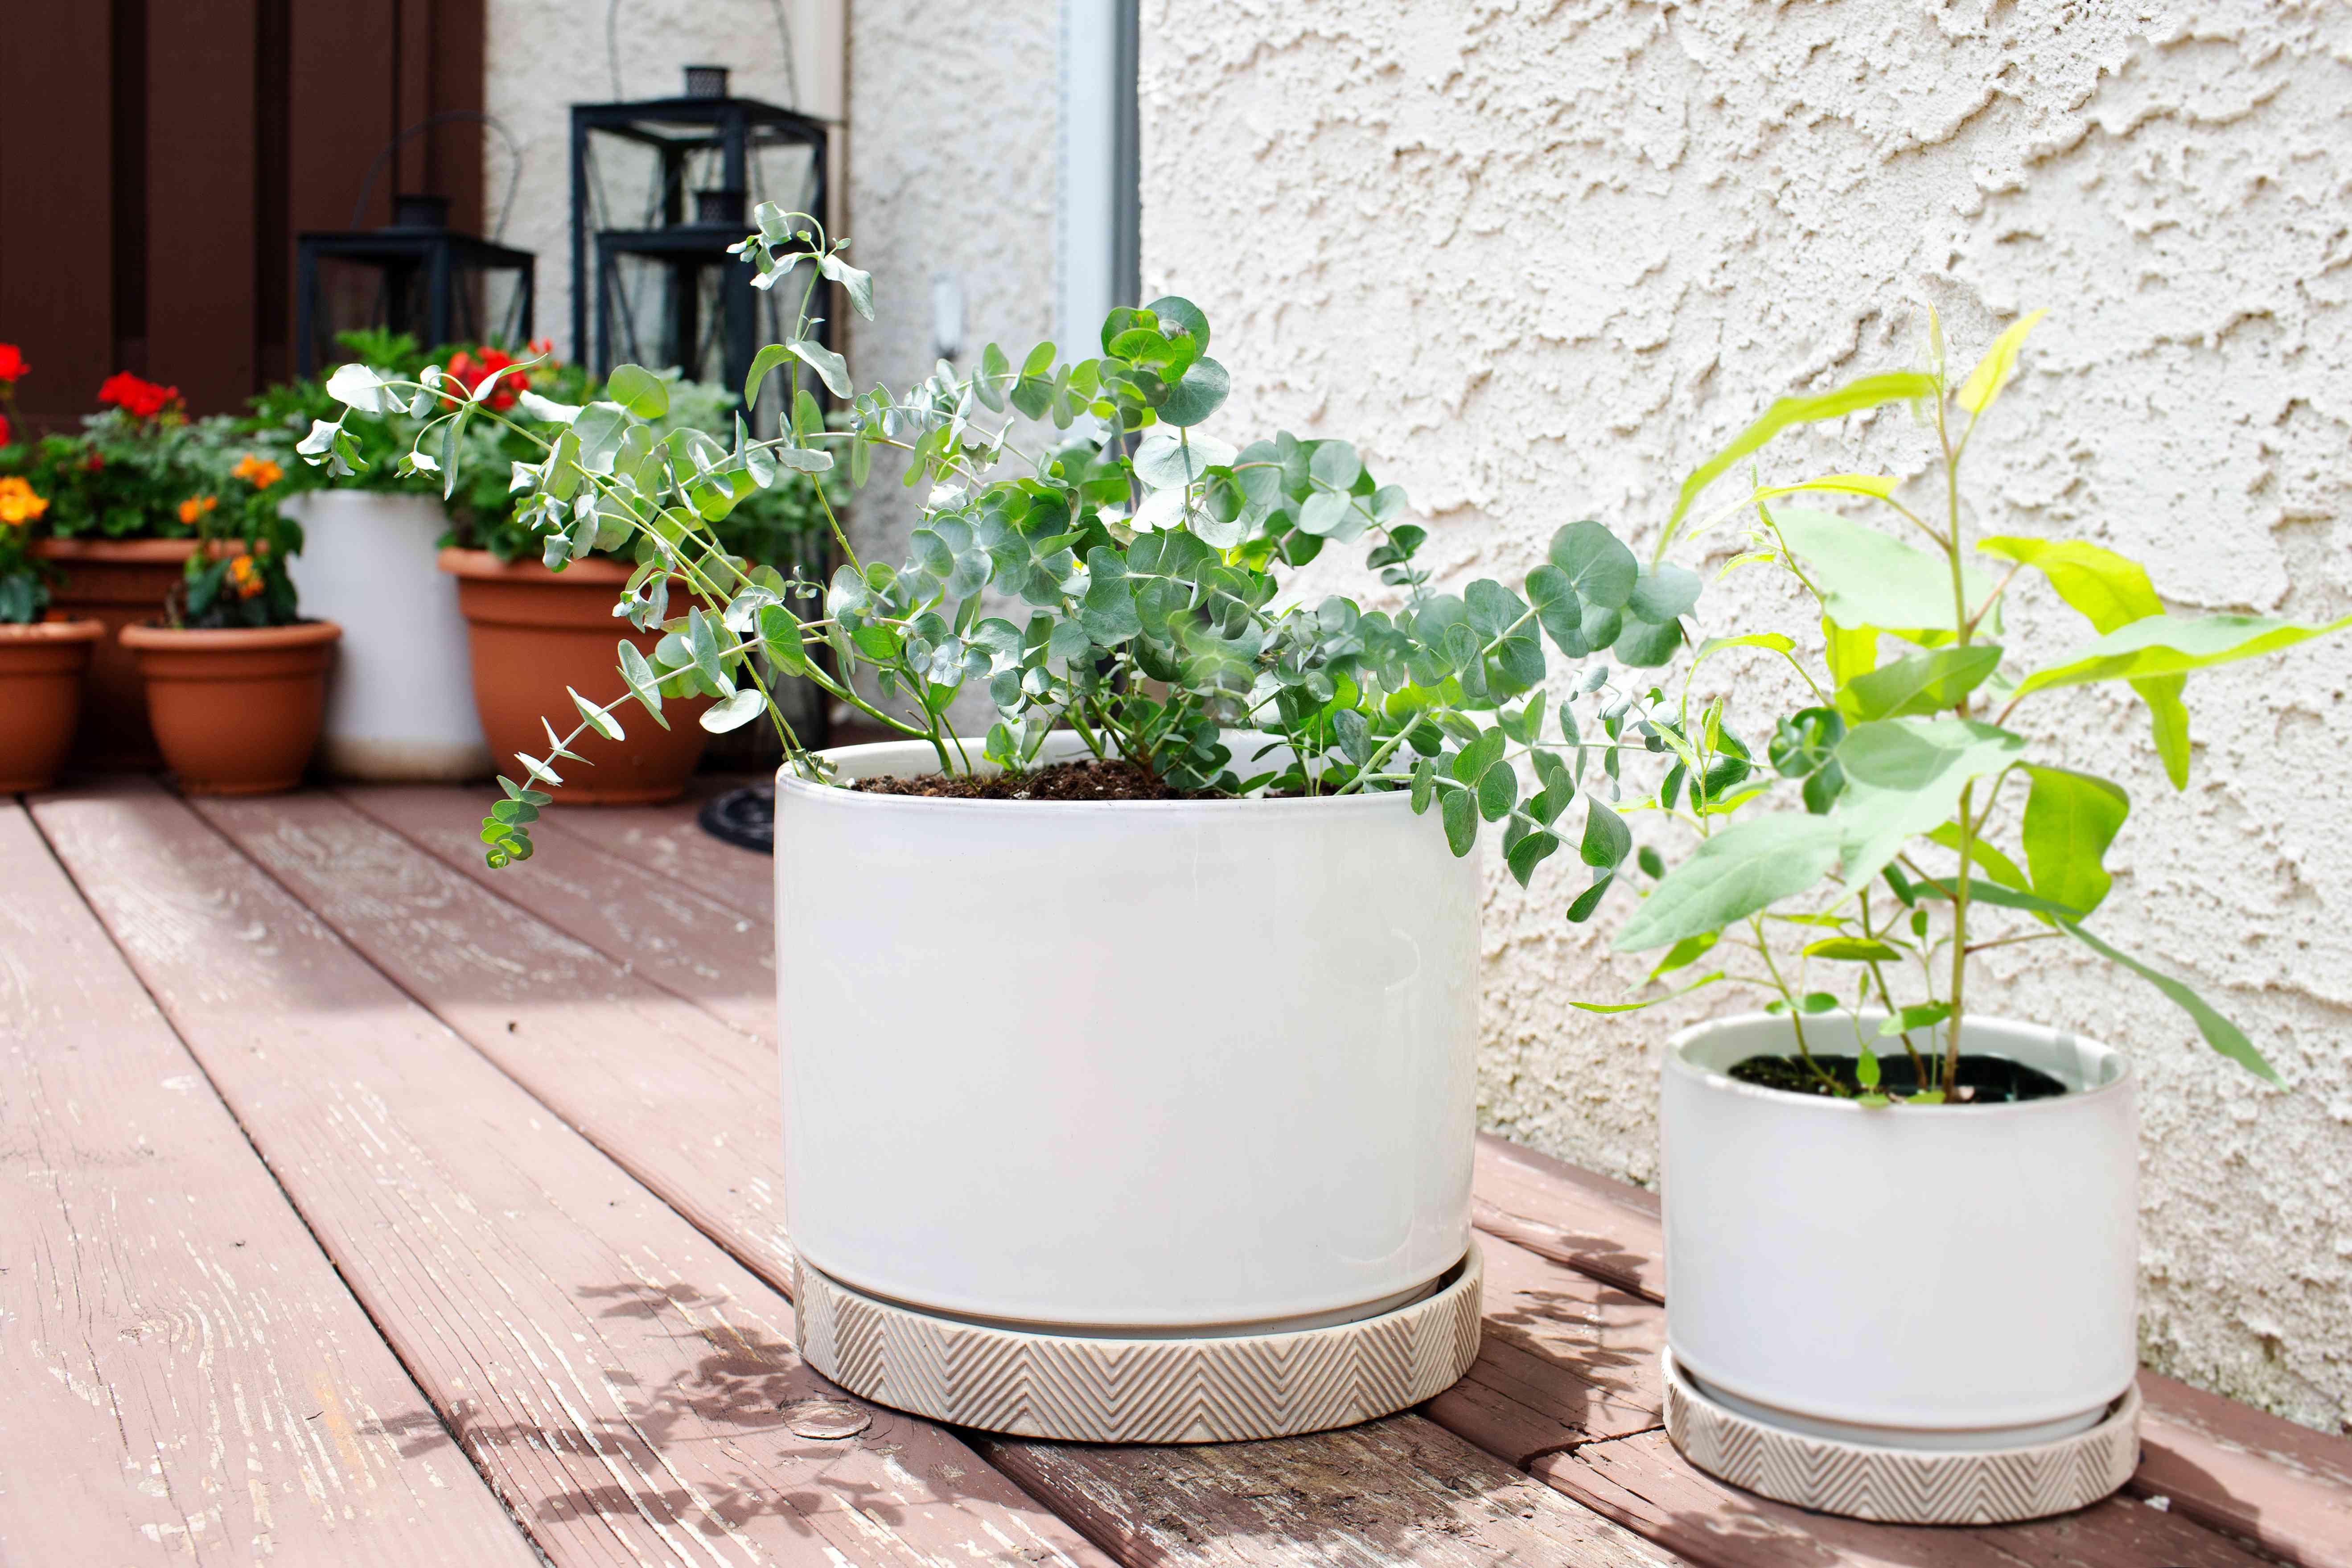 Blue eucalyptus plant in white pot outside on wooden surface in sunlight